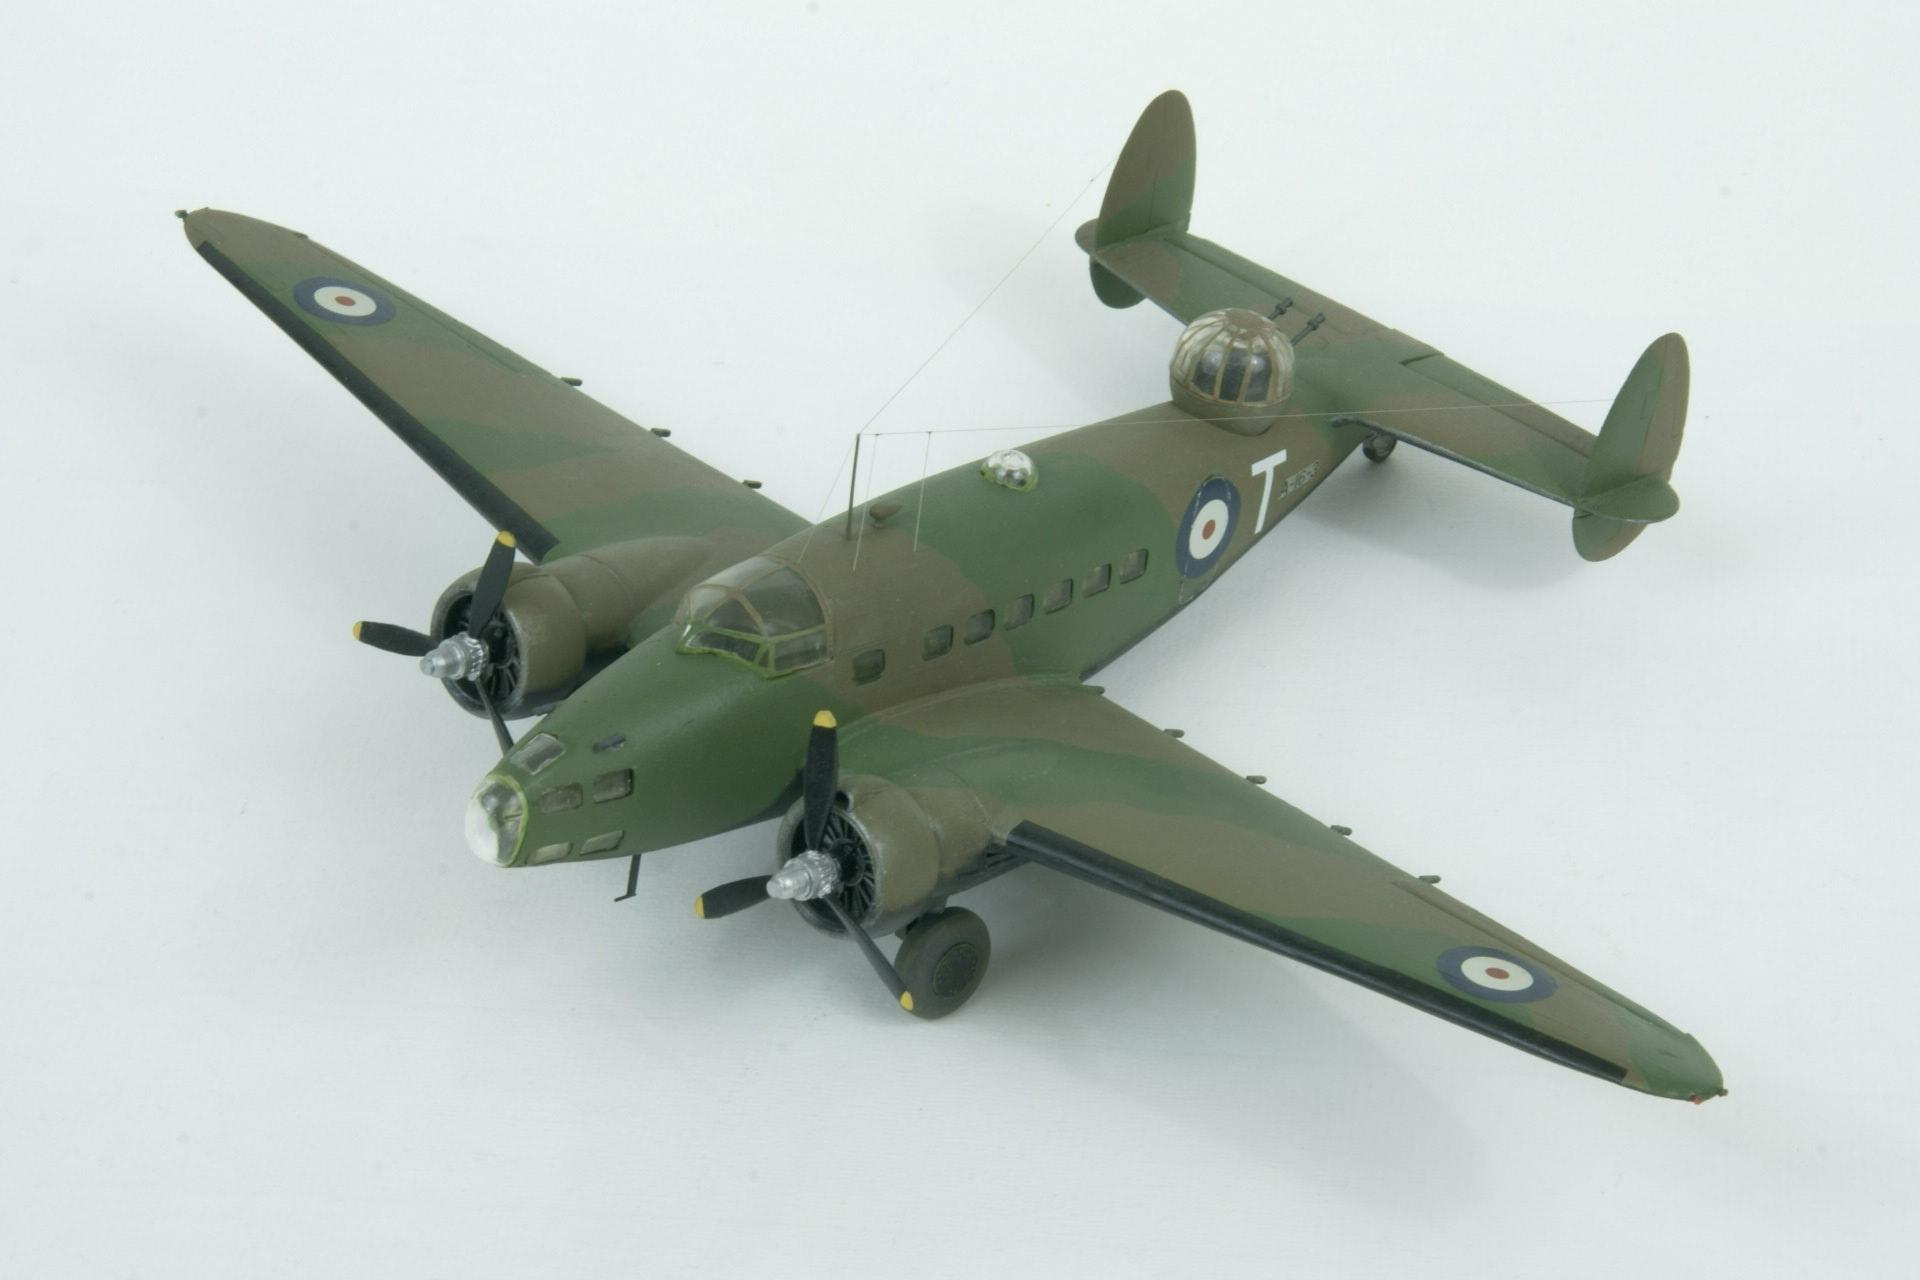 Lockheed hudson 6